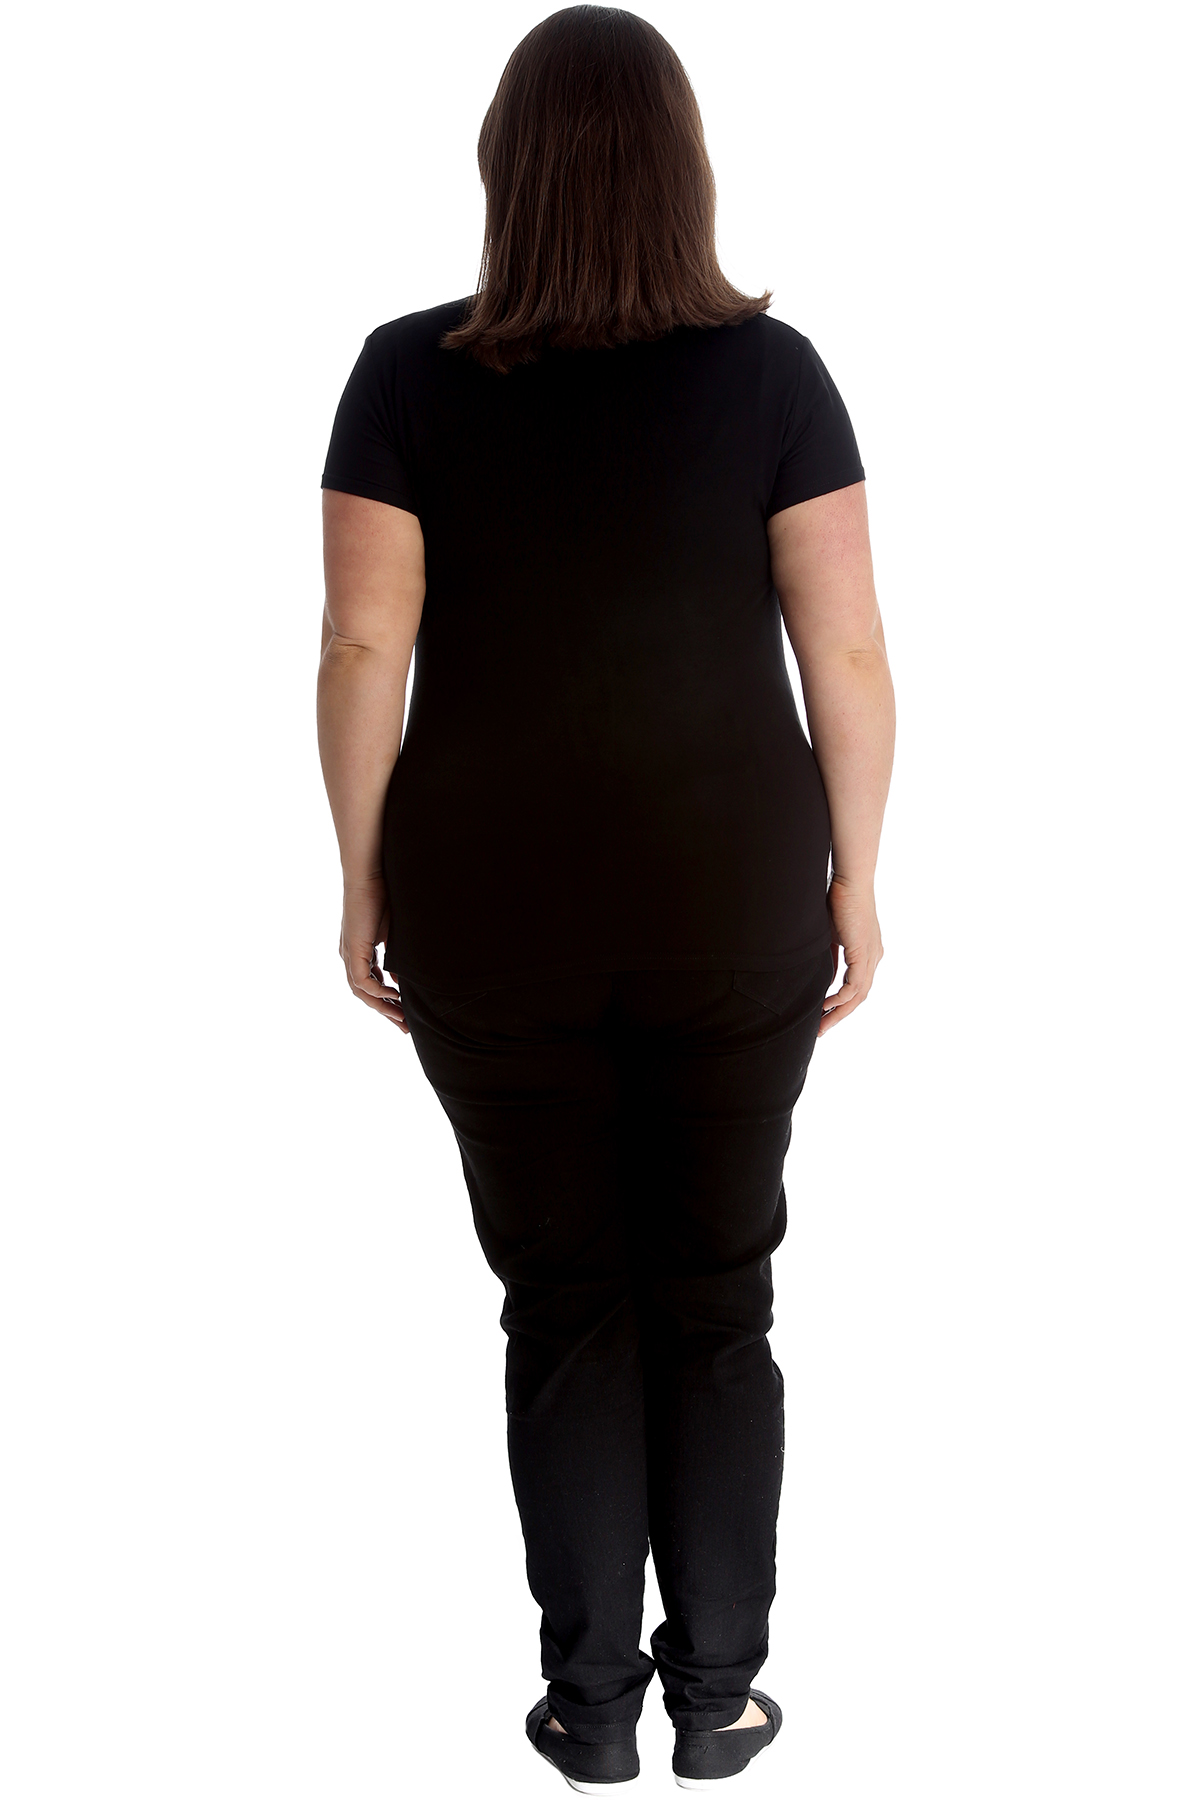 New-Womens-Plus-Size-Top-Ladies-Cherry-Rhinestone-T-Shirt-Soft-Stud-Shiny-Hip thumbnail 10